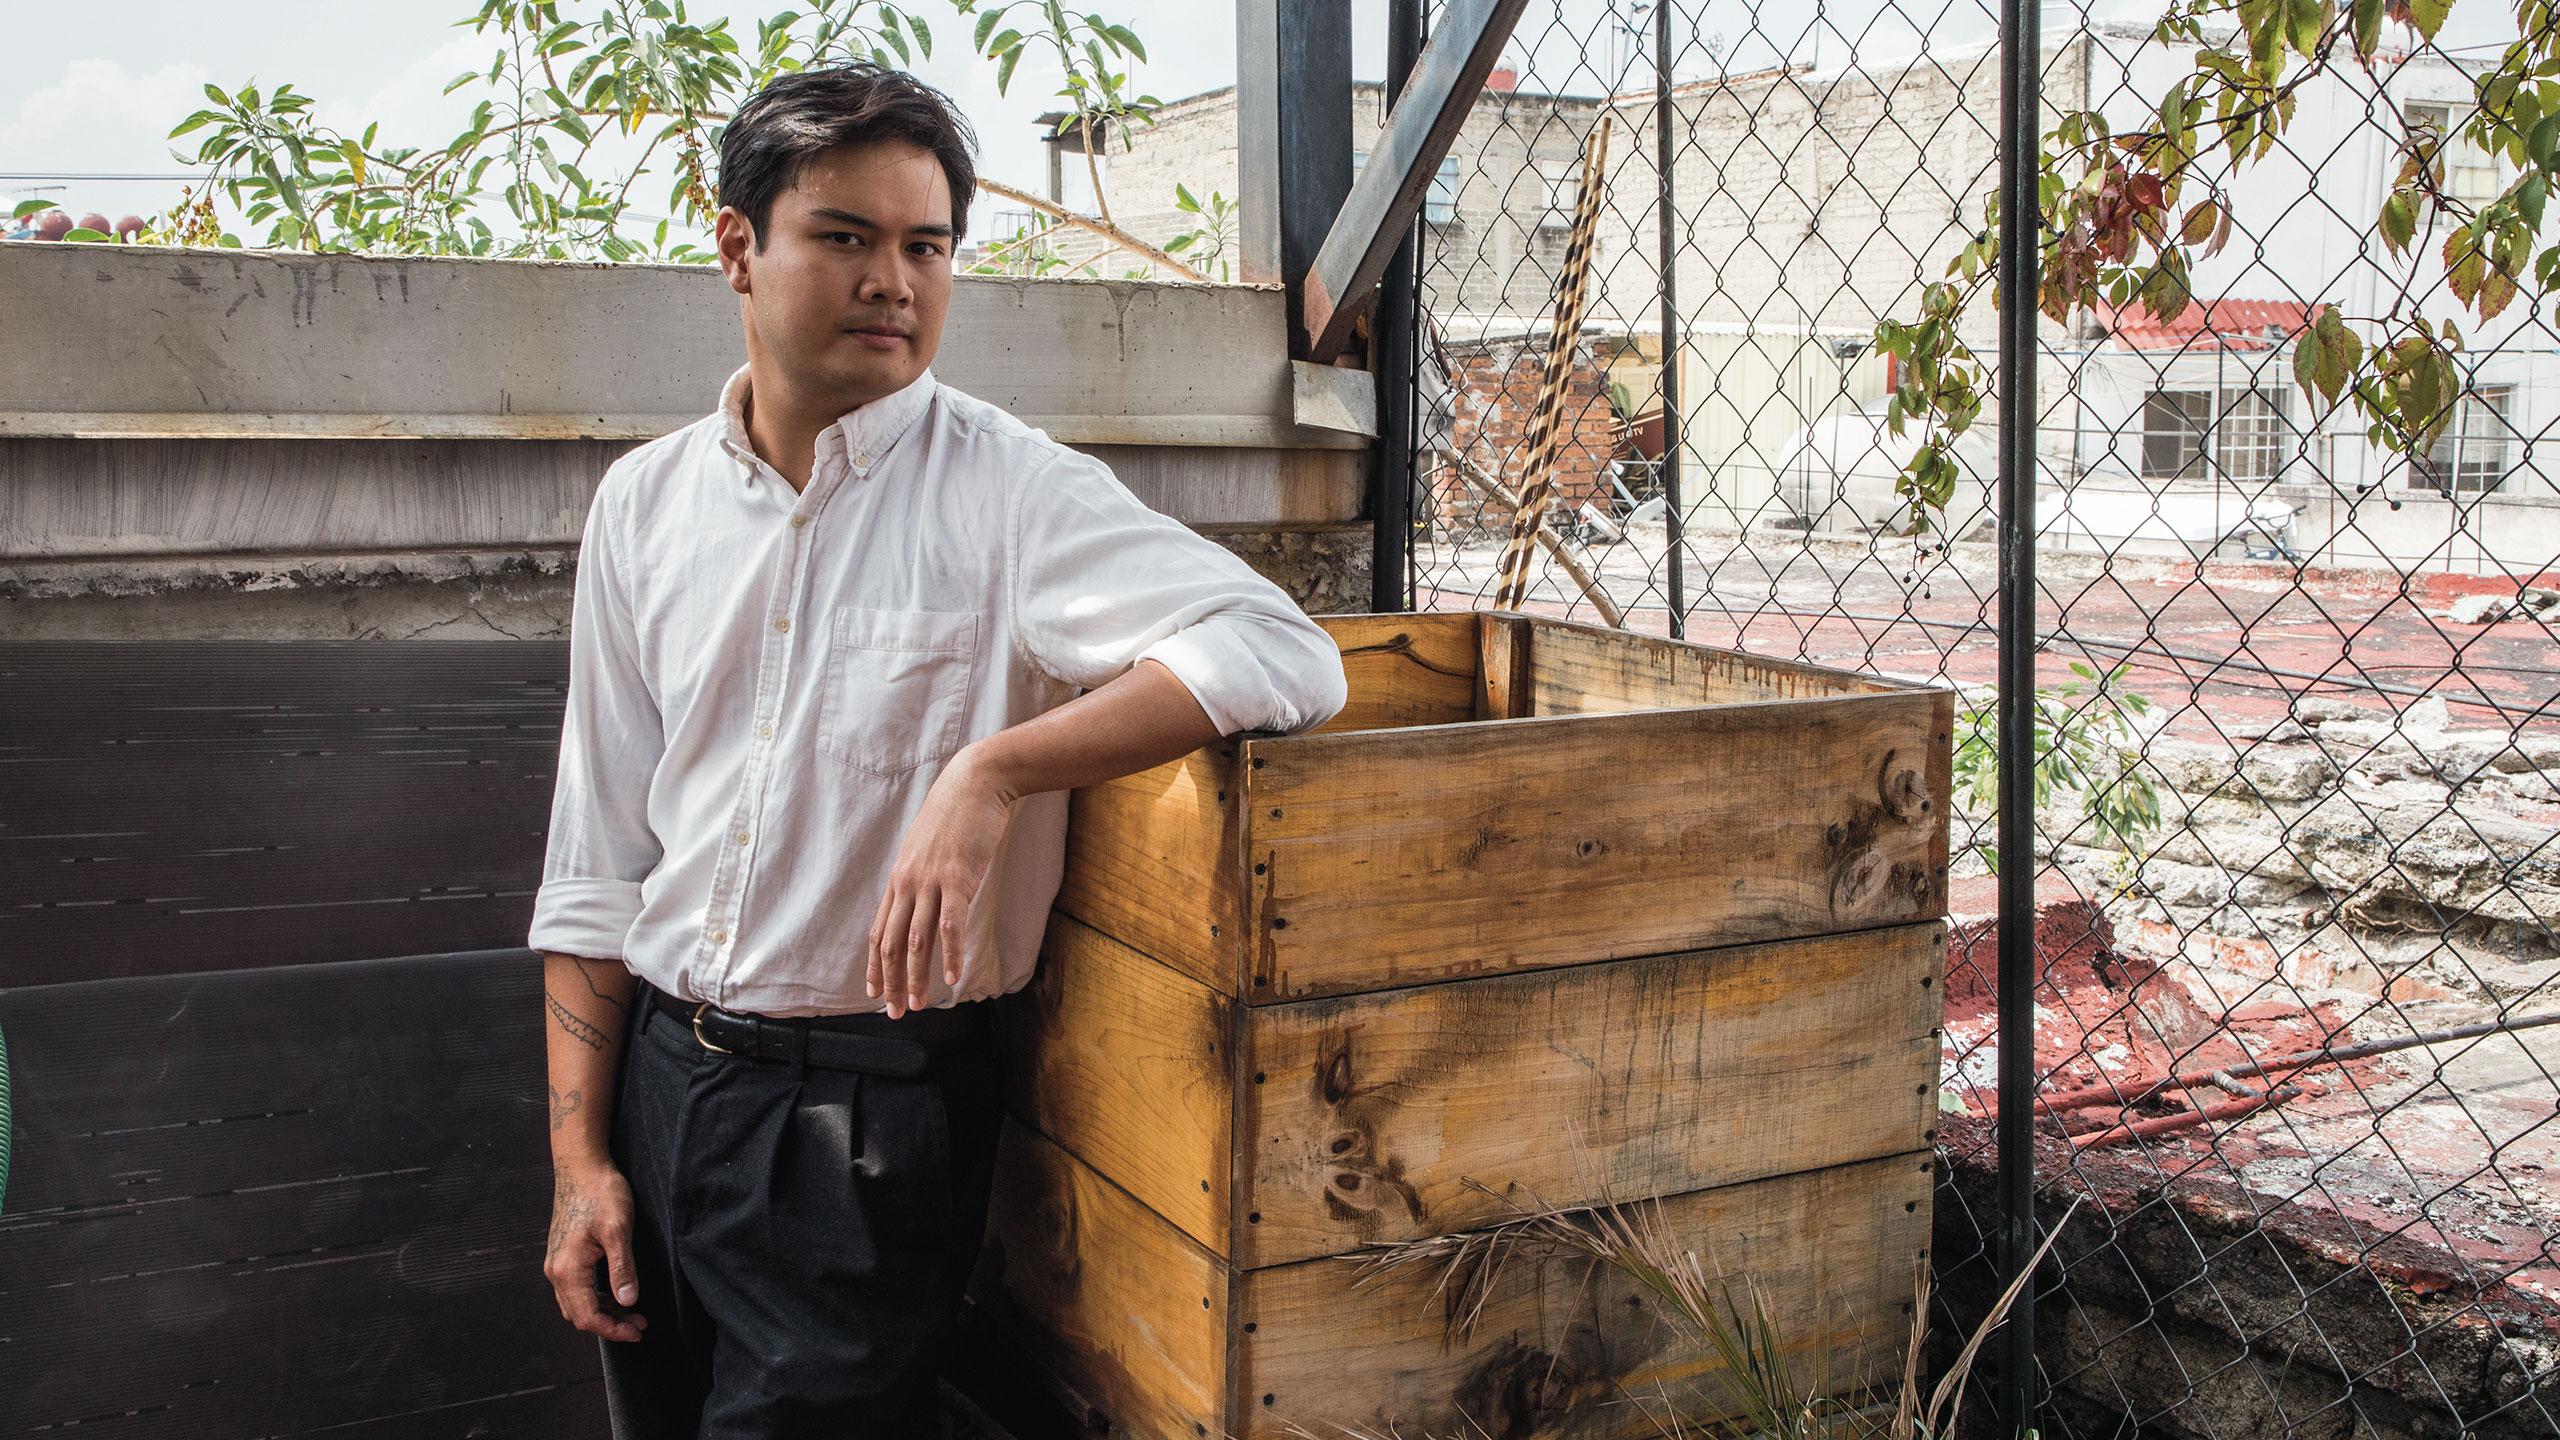 Micheal-Crespo-Best-New-Chefs-2021